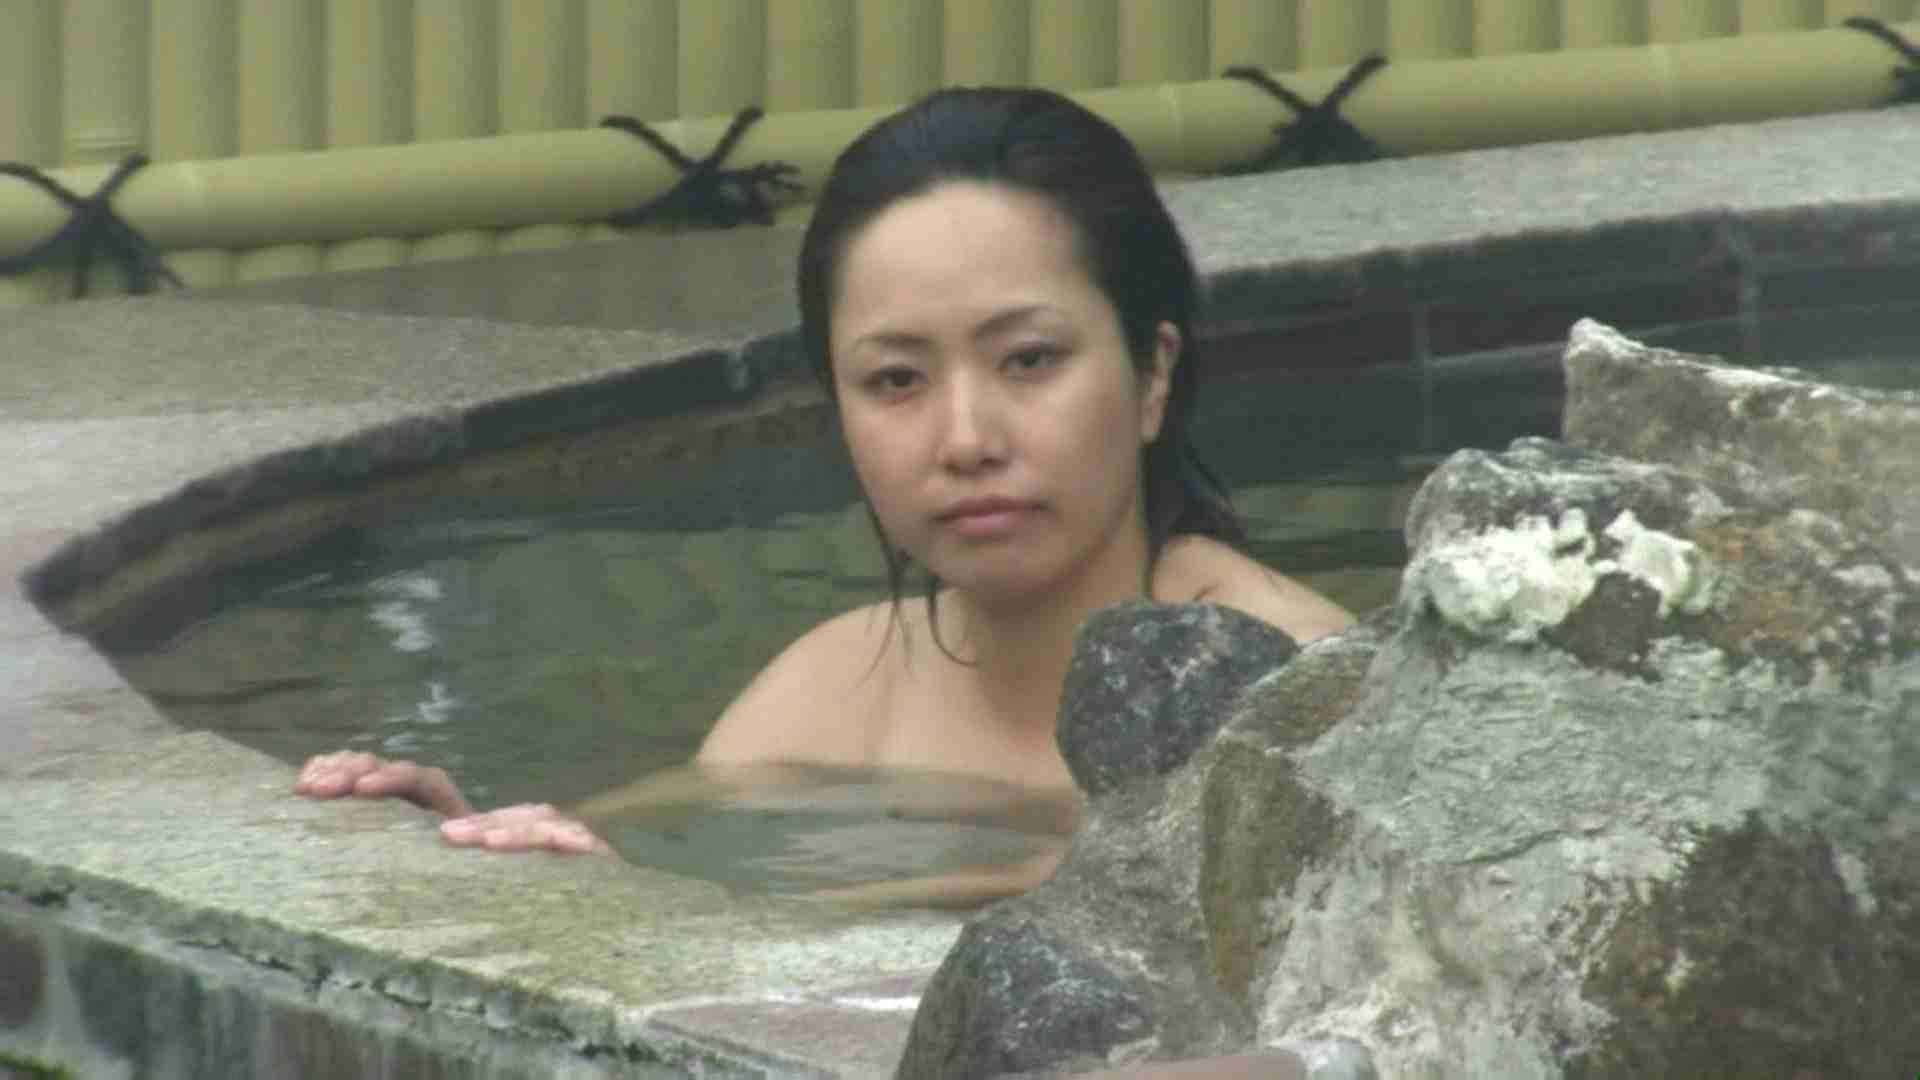 Aquaな露天風呂Vol.604 露天風呂編 | 盗撮シリーズ  89PIX 1